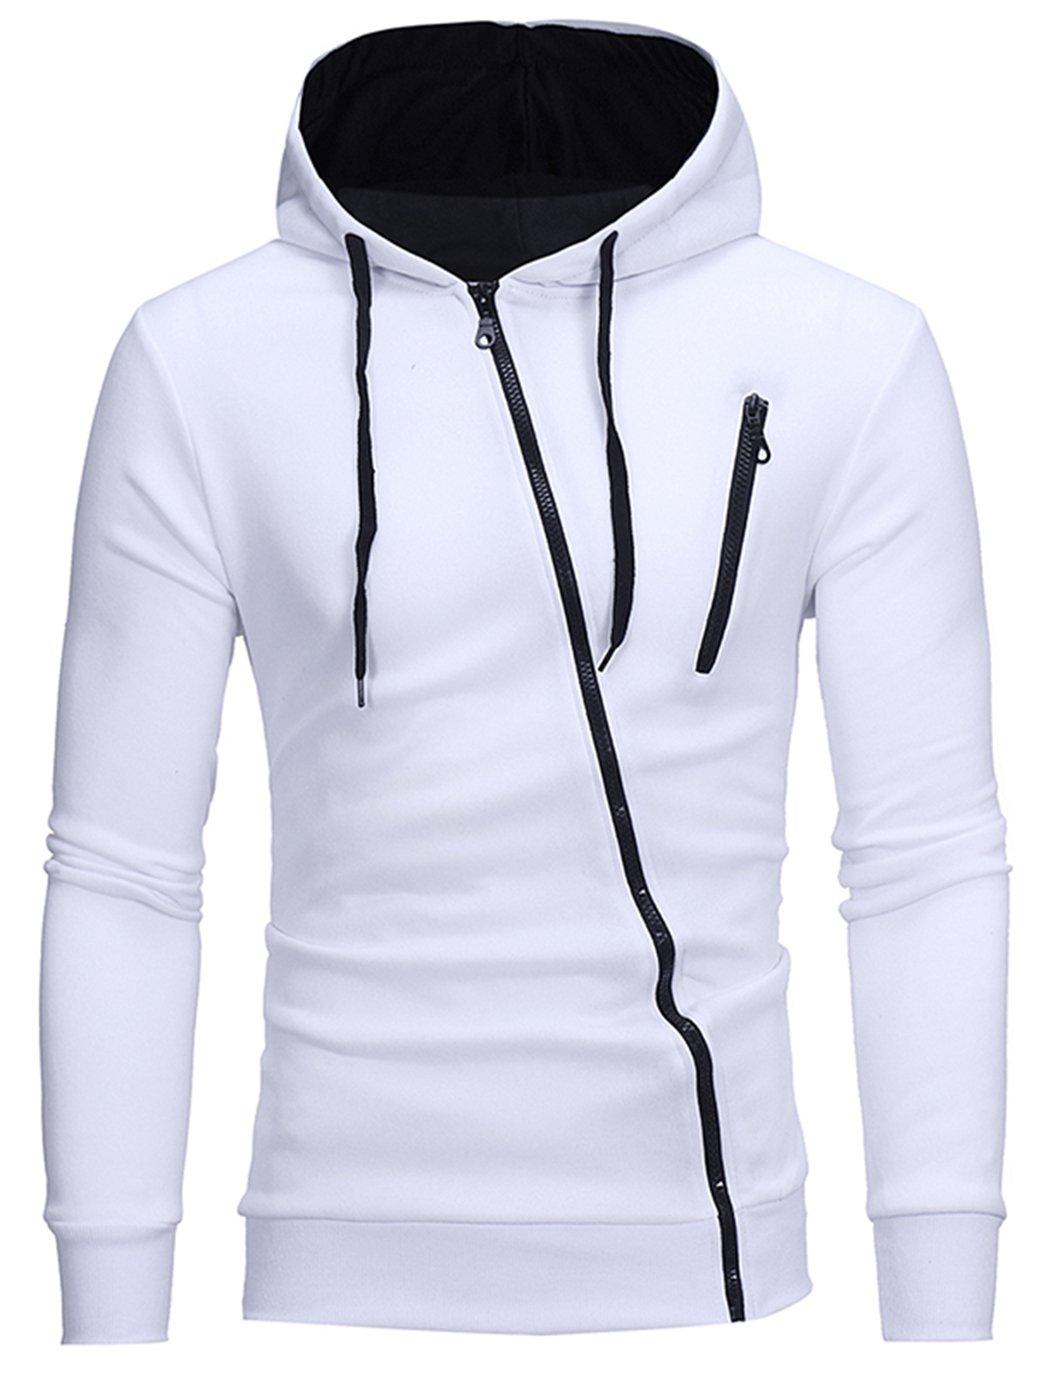 HOP FASHION Mens Casual Long Sleeve Sport Hoodies Diagonal Design Zip up Lightweight Sweatshirt Jacket Coat HOPM028-White-M